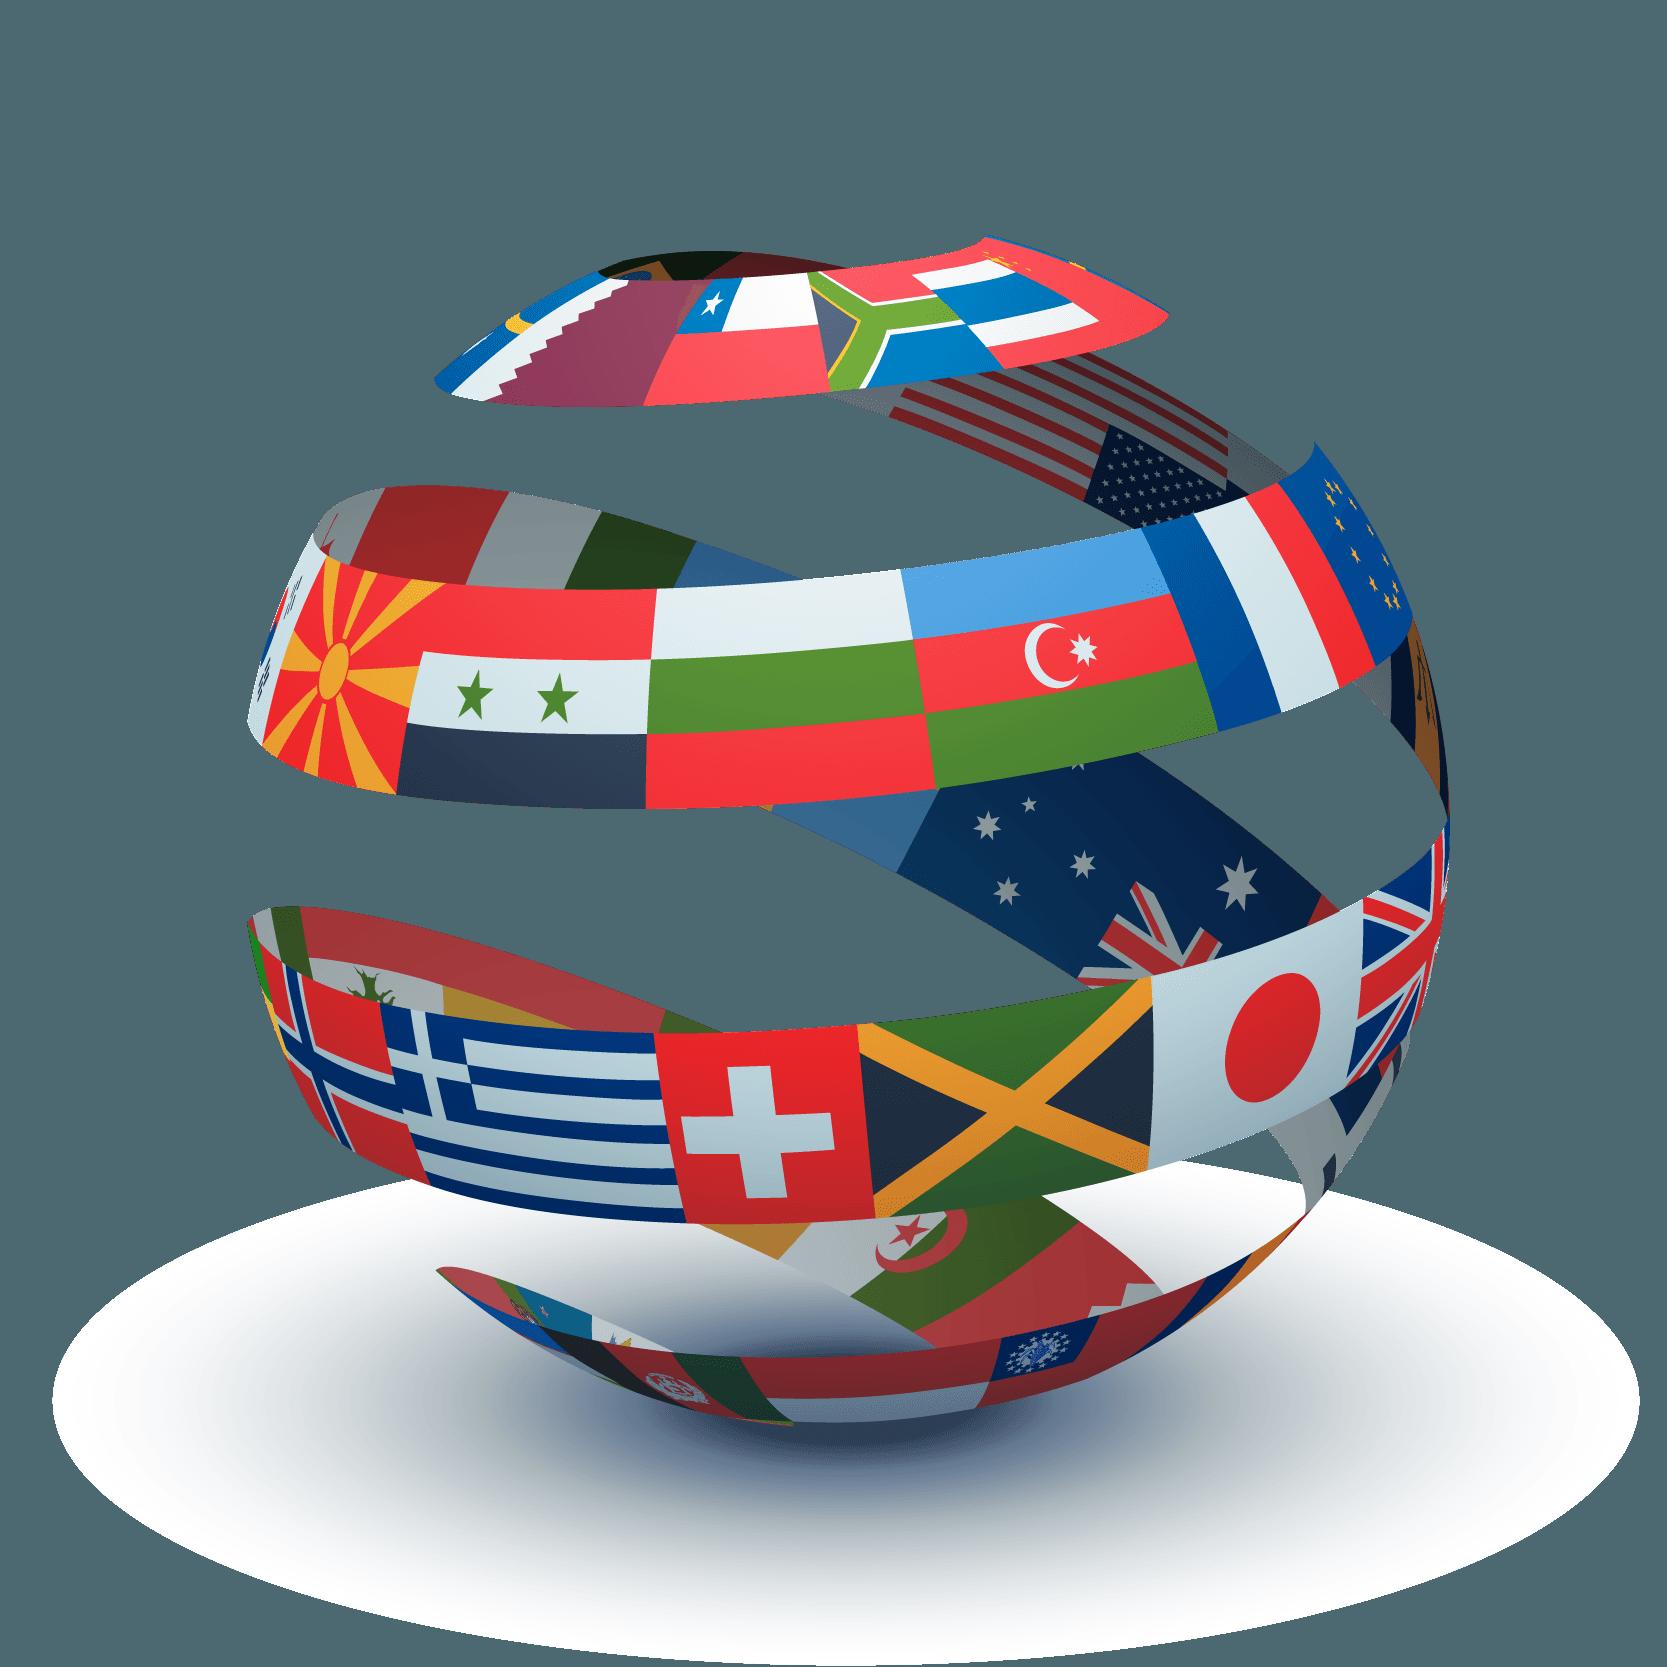 p g international expansion